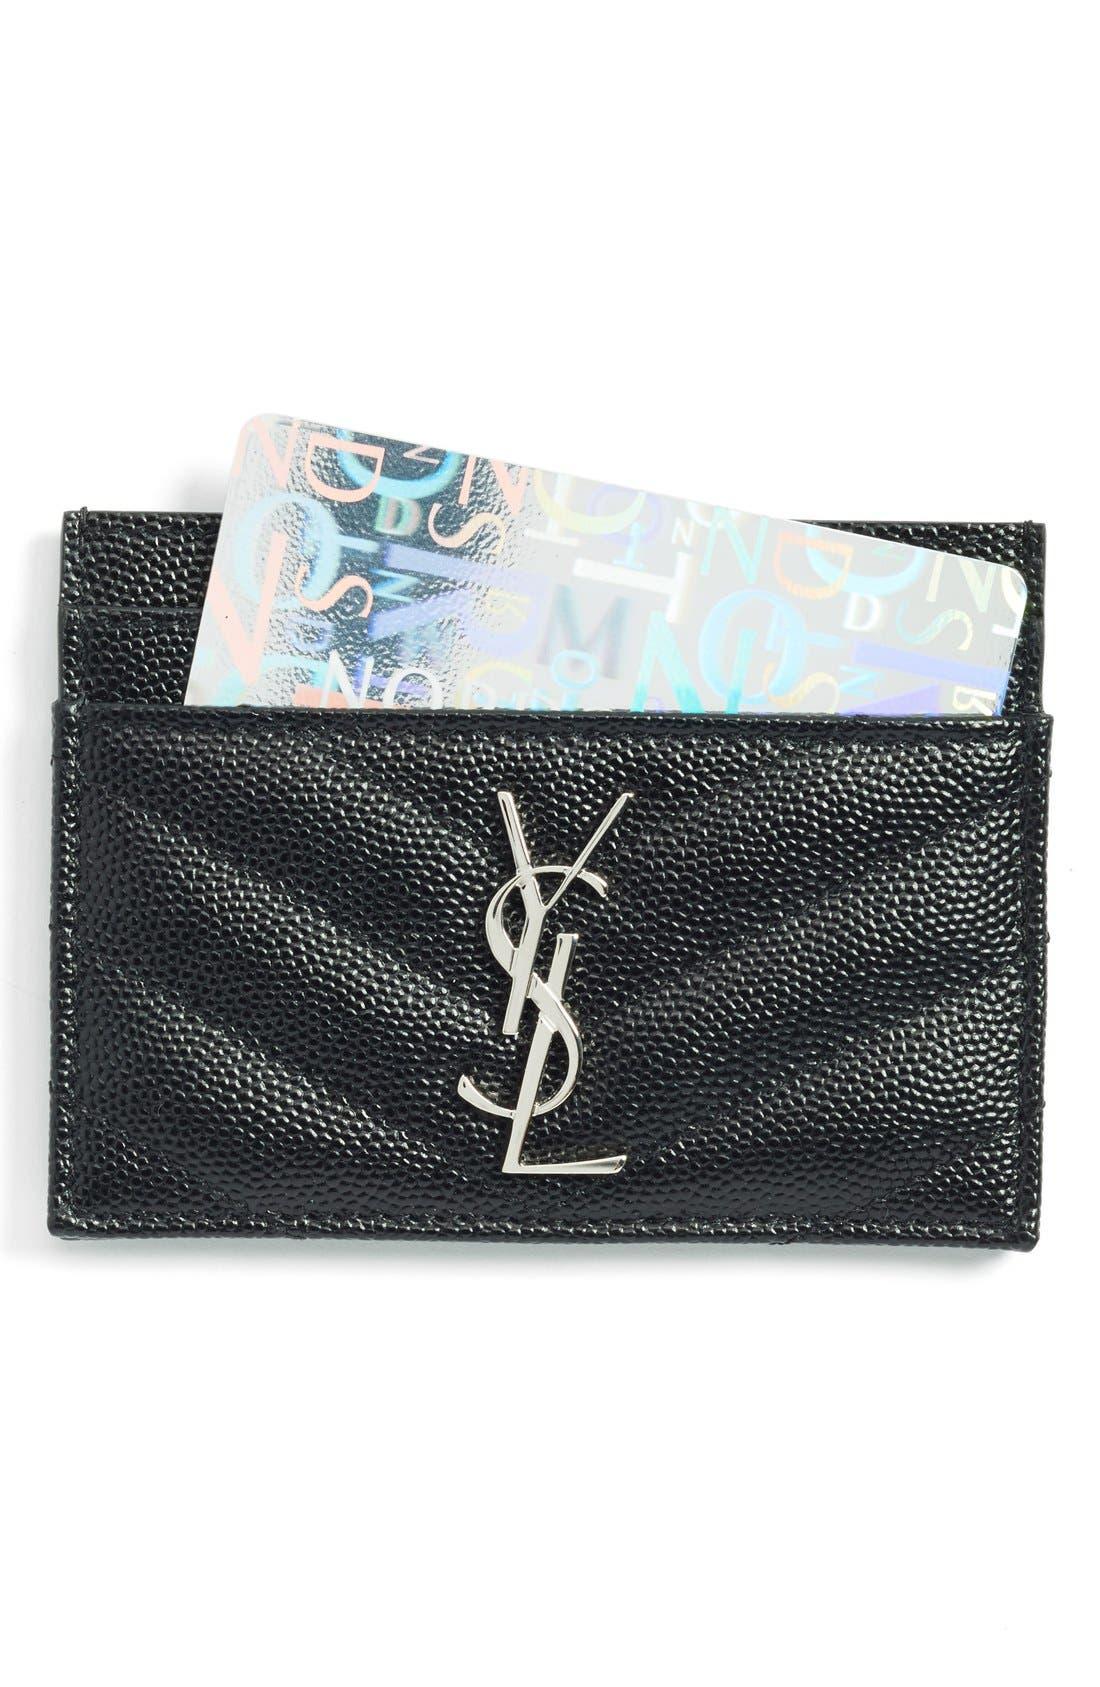 SAINT LAURENT Monogram Credit Card Case